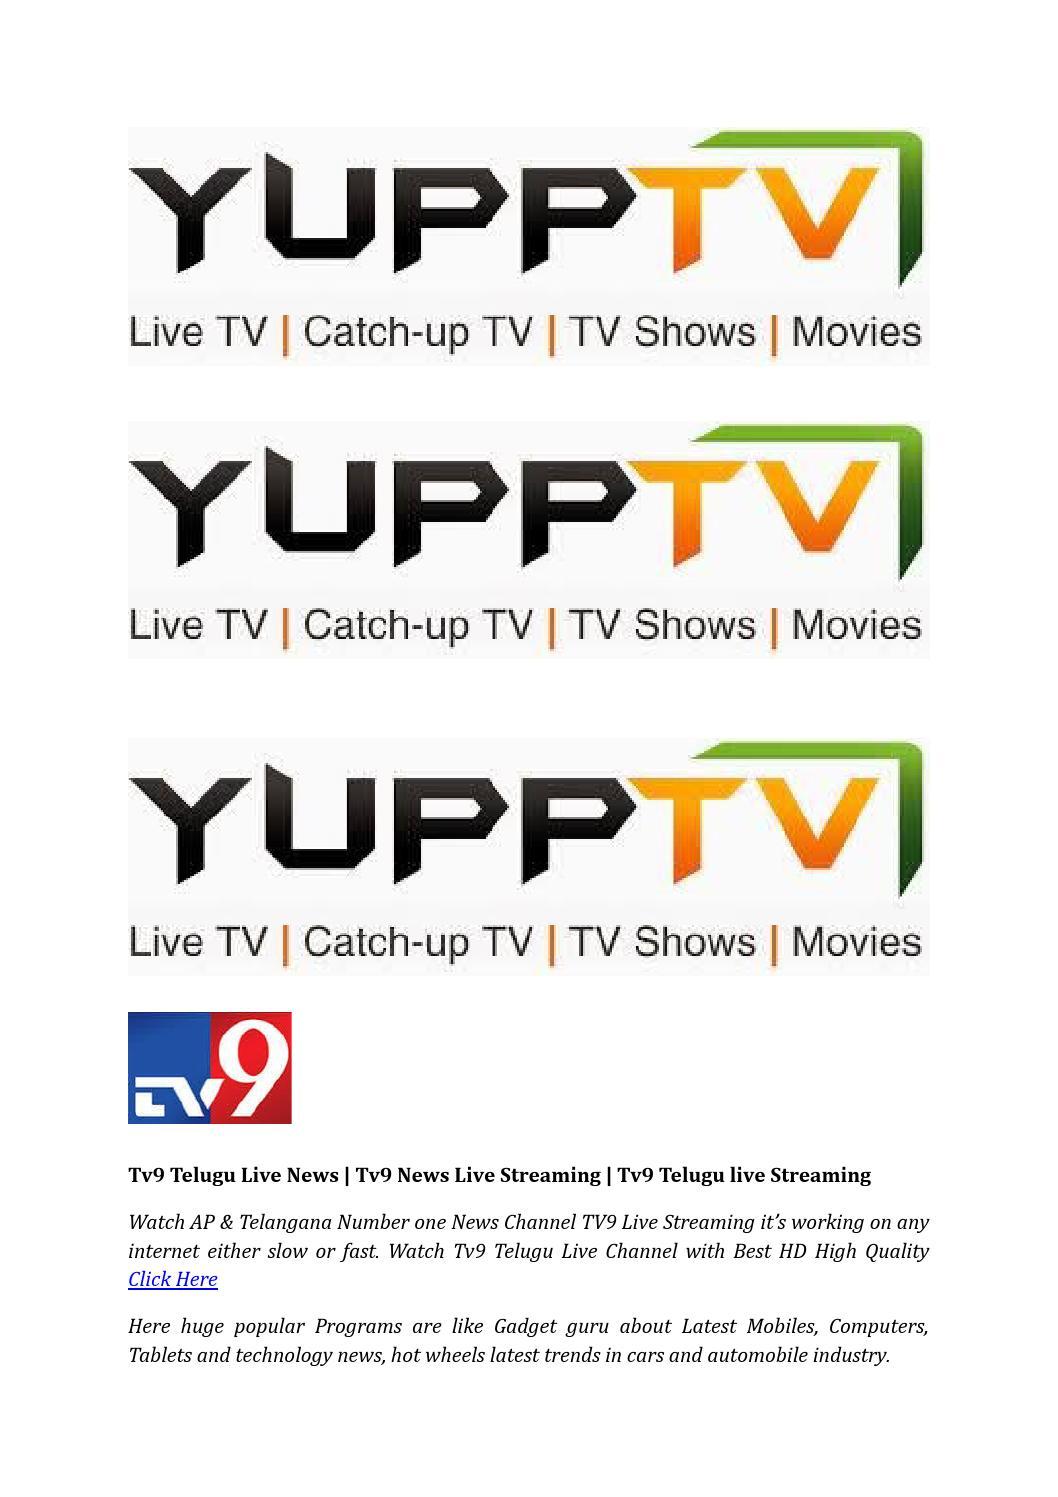 Tv 9 News Live Today Tv9 Kannada Live ಟಿವಿ9 ಕನ್ನಡ